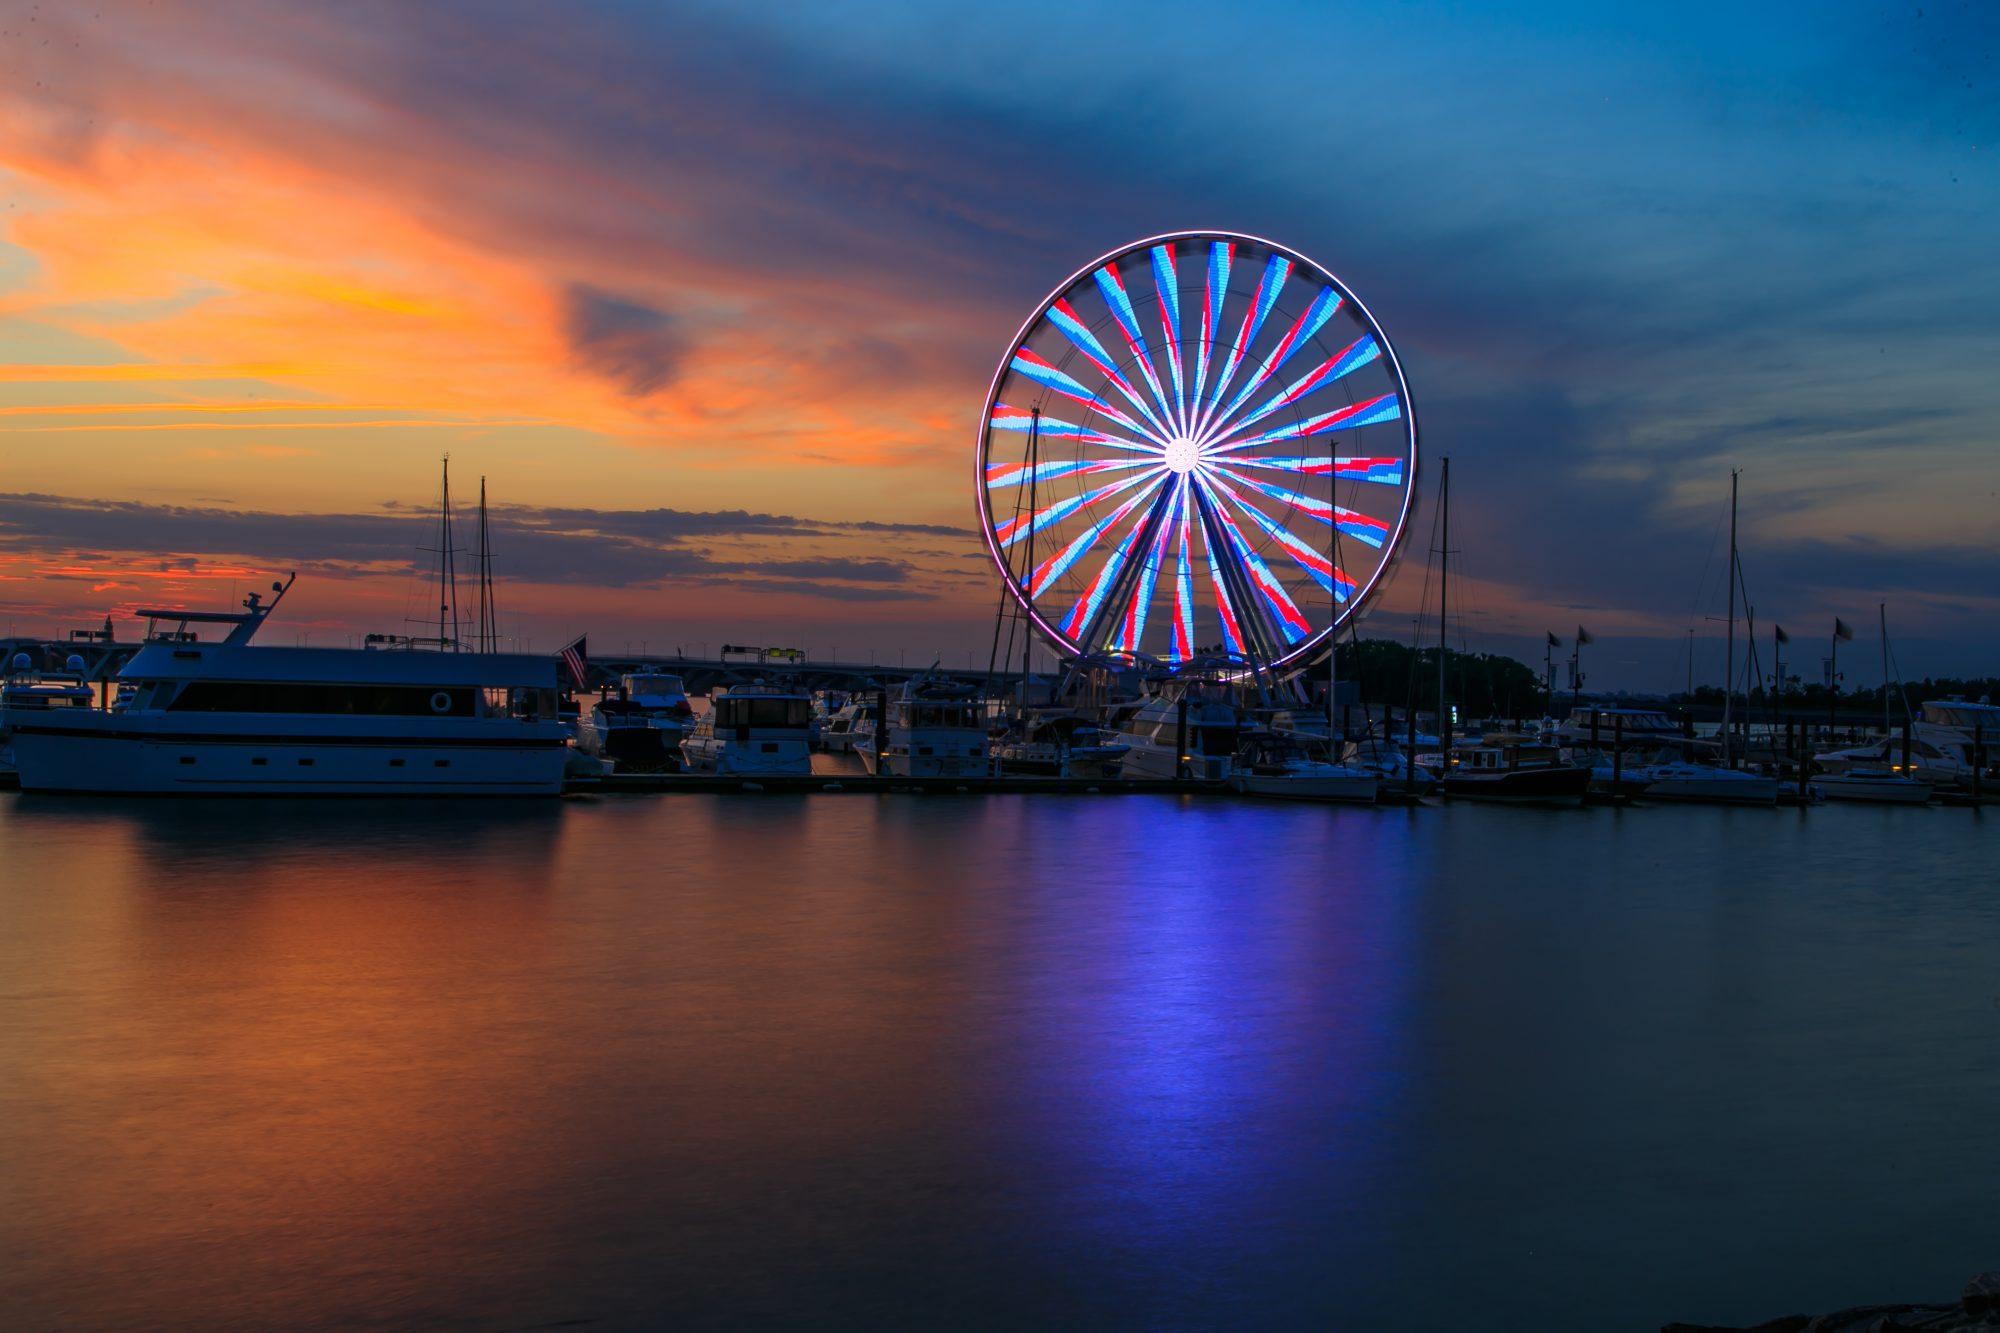 Red Blue Evening Capital Wheel